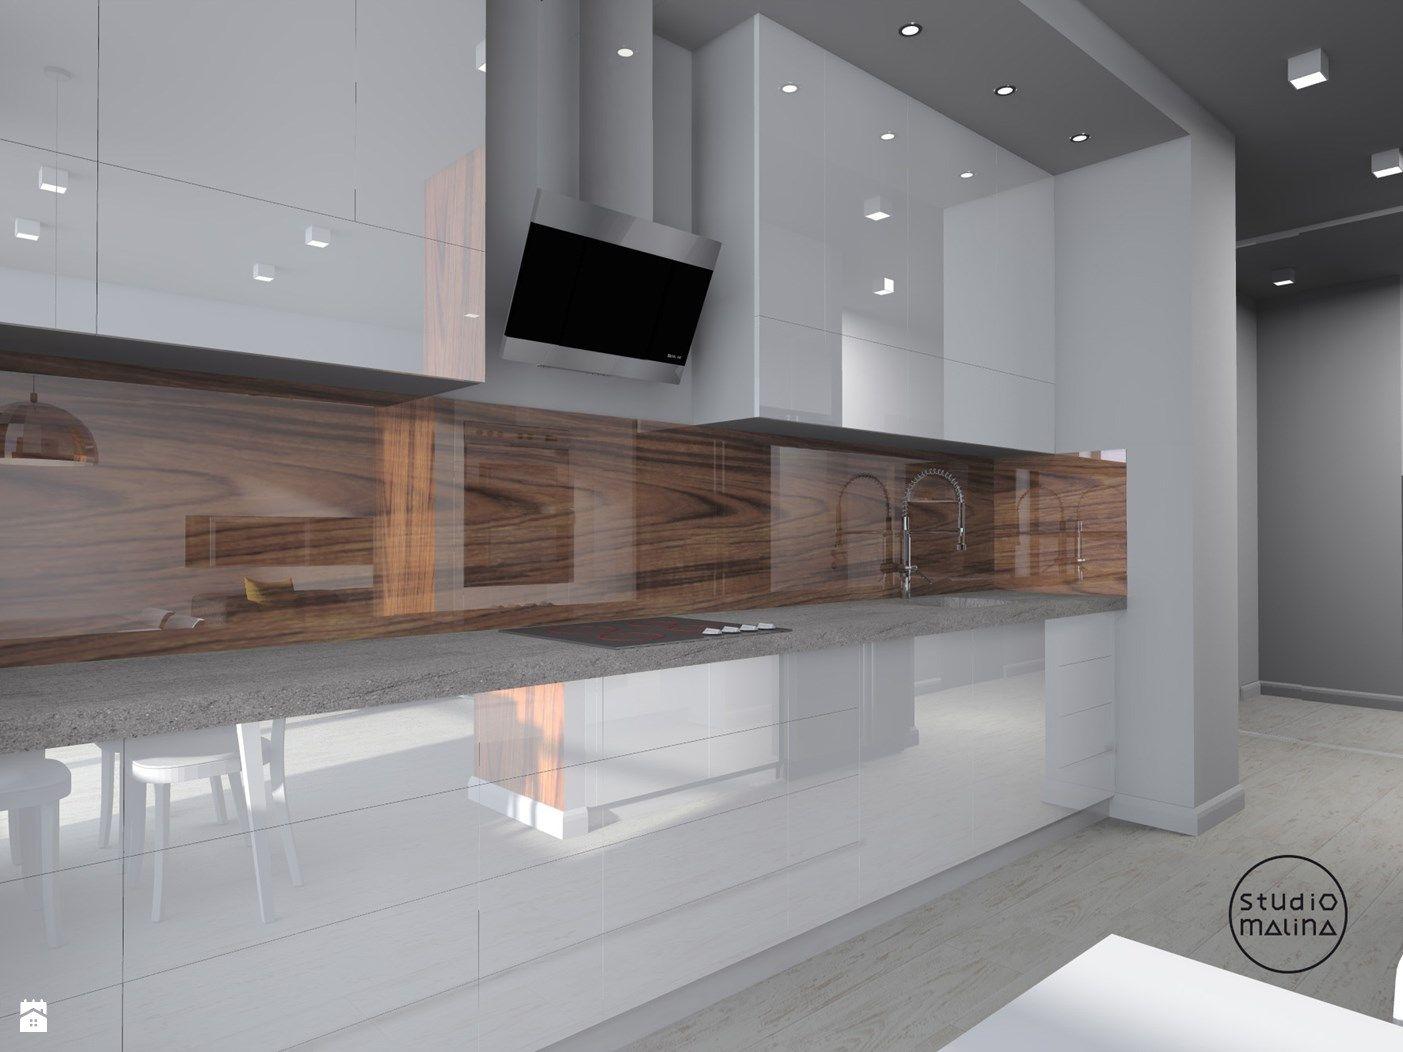 Otwarta kuchnia w bieli hola design homesquare - Kuchnia Zdj Cie Od Studio Malina Architekci Projektanci Wn Trz Kuchnia Studio Malina